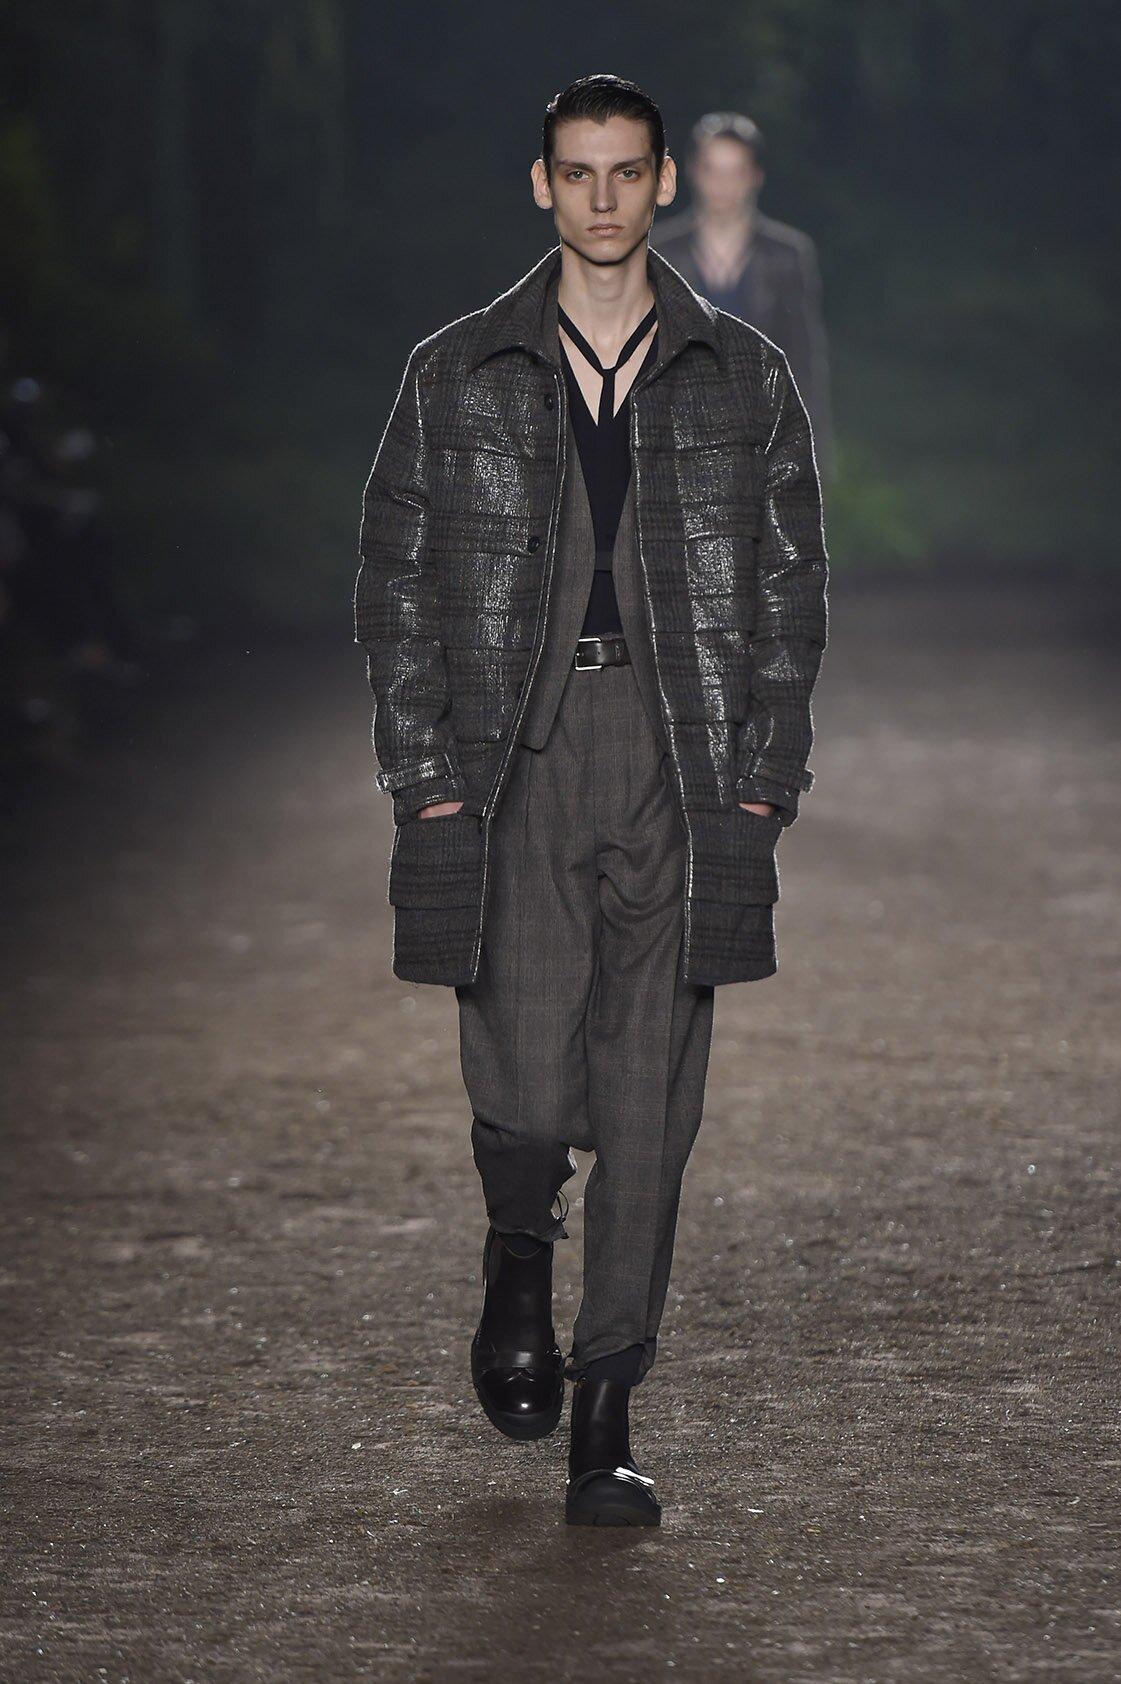 Catwalk Ermenegildo Zegna Couture Fashion Show Winter 2015